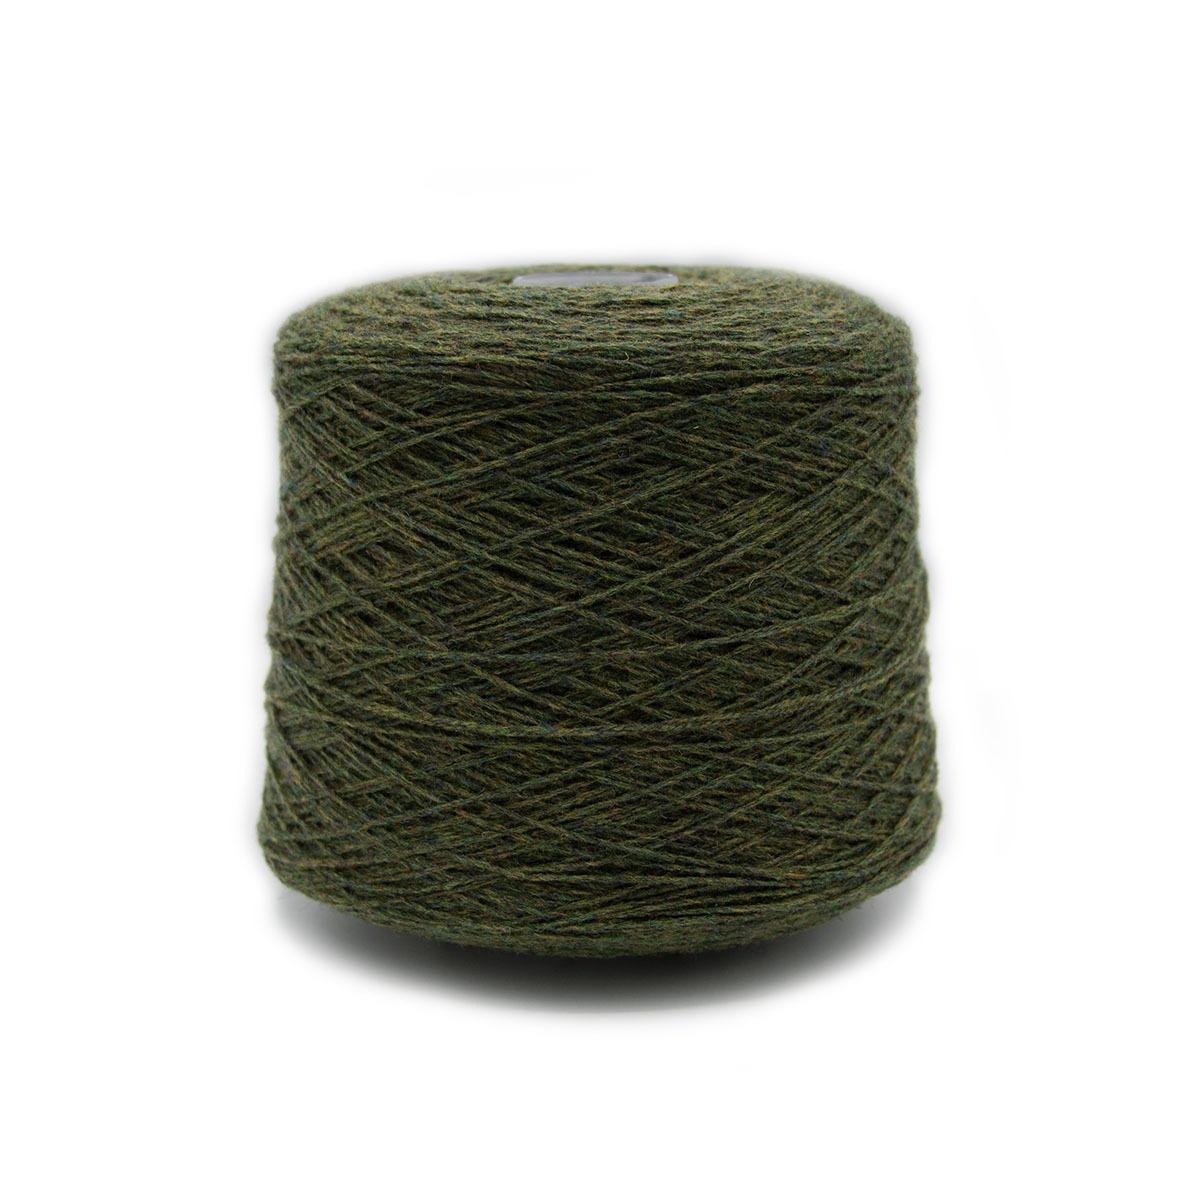 Knoll Yarns Merino Lambswool - 126